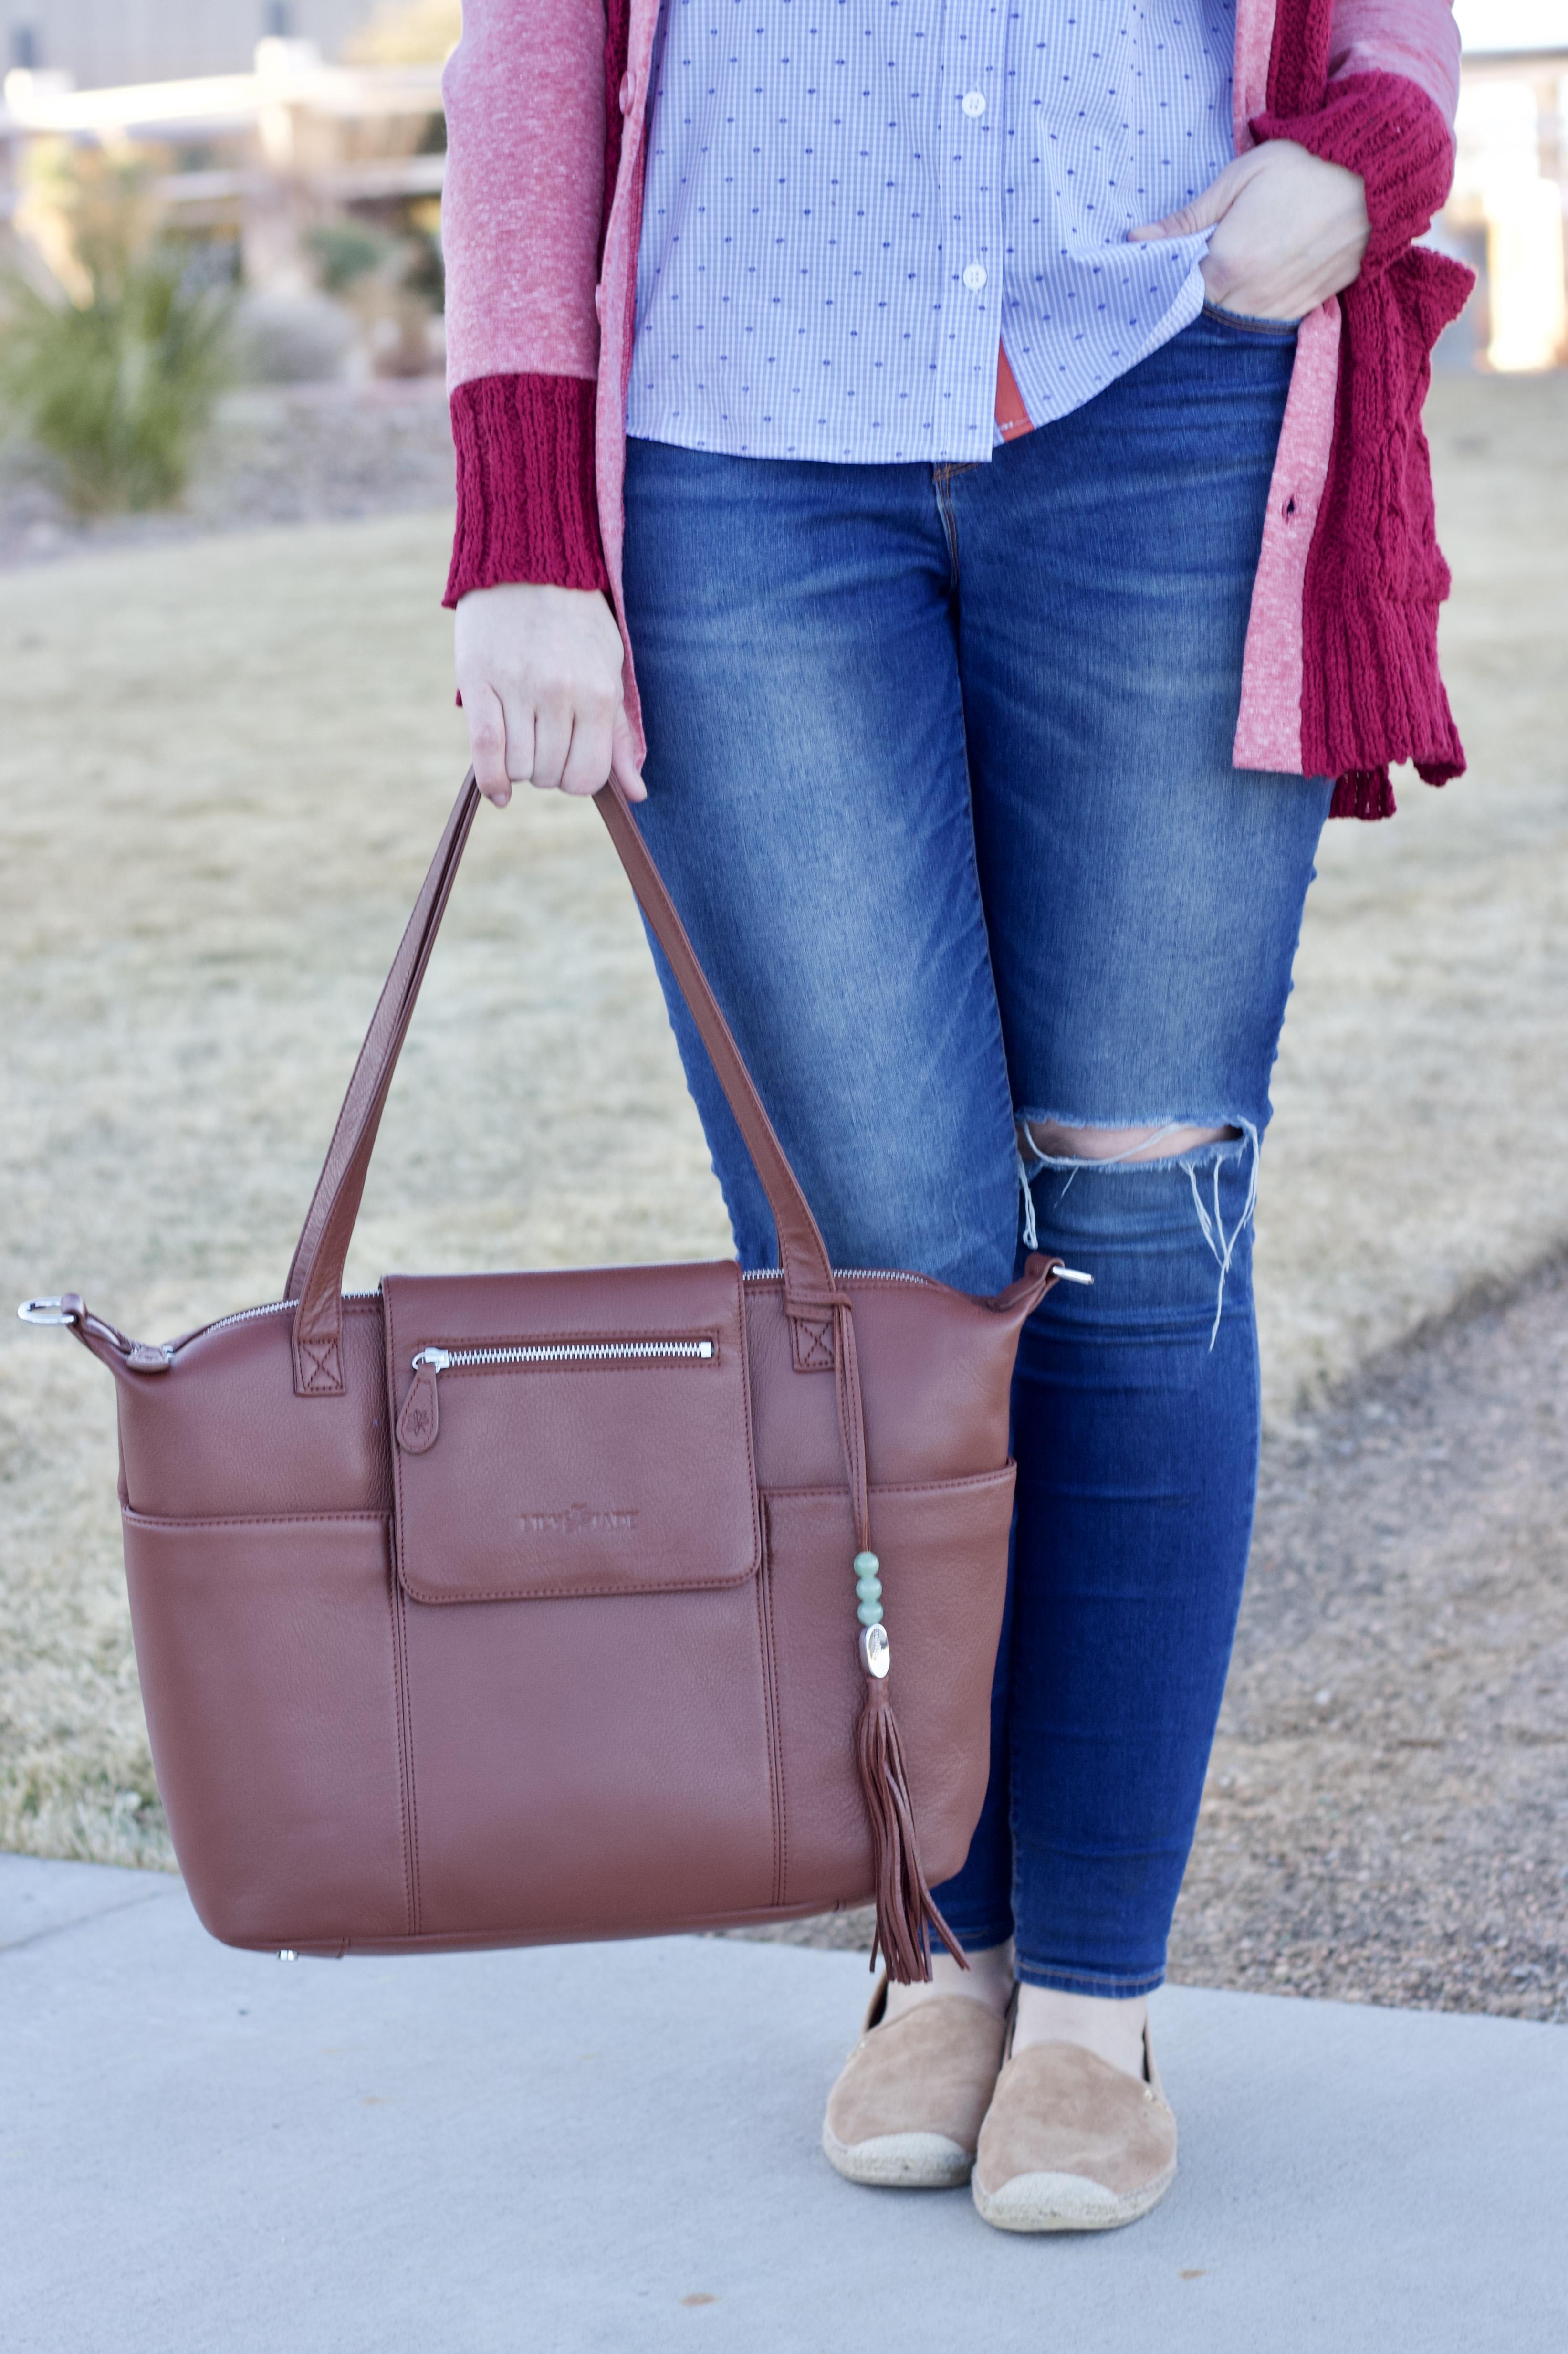 Lily Jade Madeline bag #lilyjade #madelinebag #diaperbag